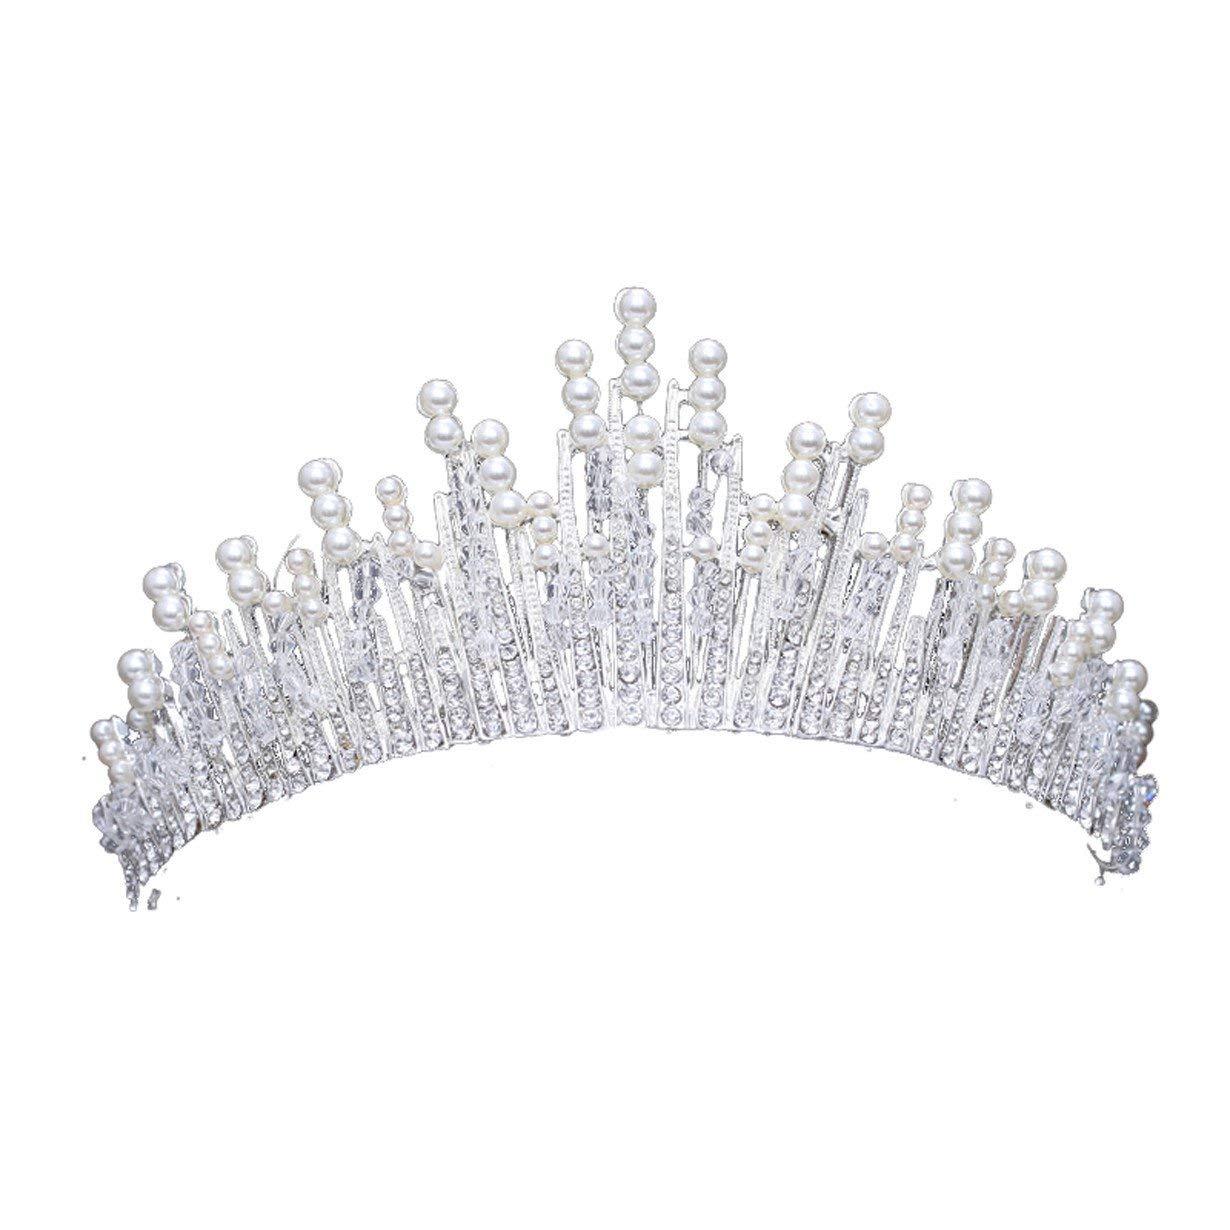 Crystal Crown, Diamond Drill Bridal Headwear Crystal Pearl Crown Princess Crown Wedding Dress Accessories